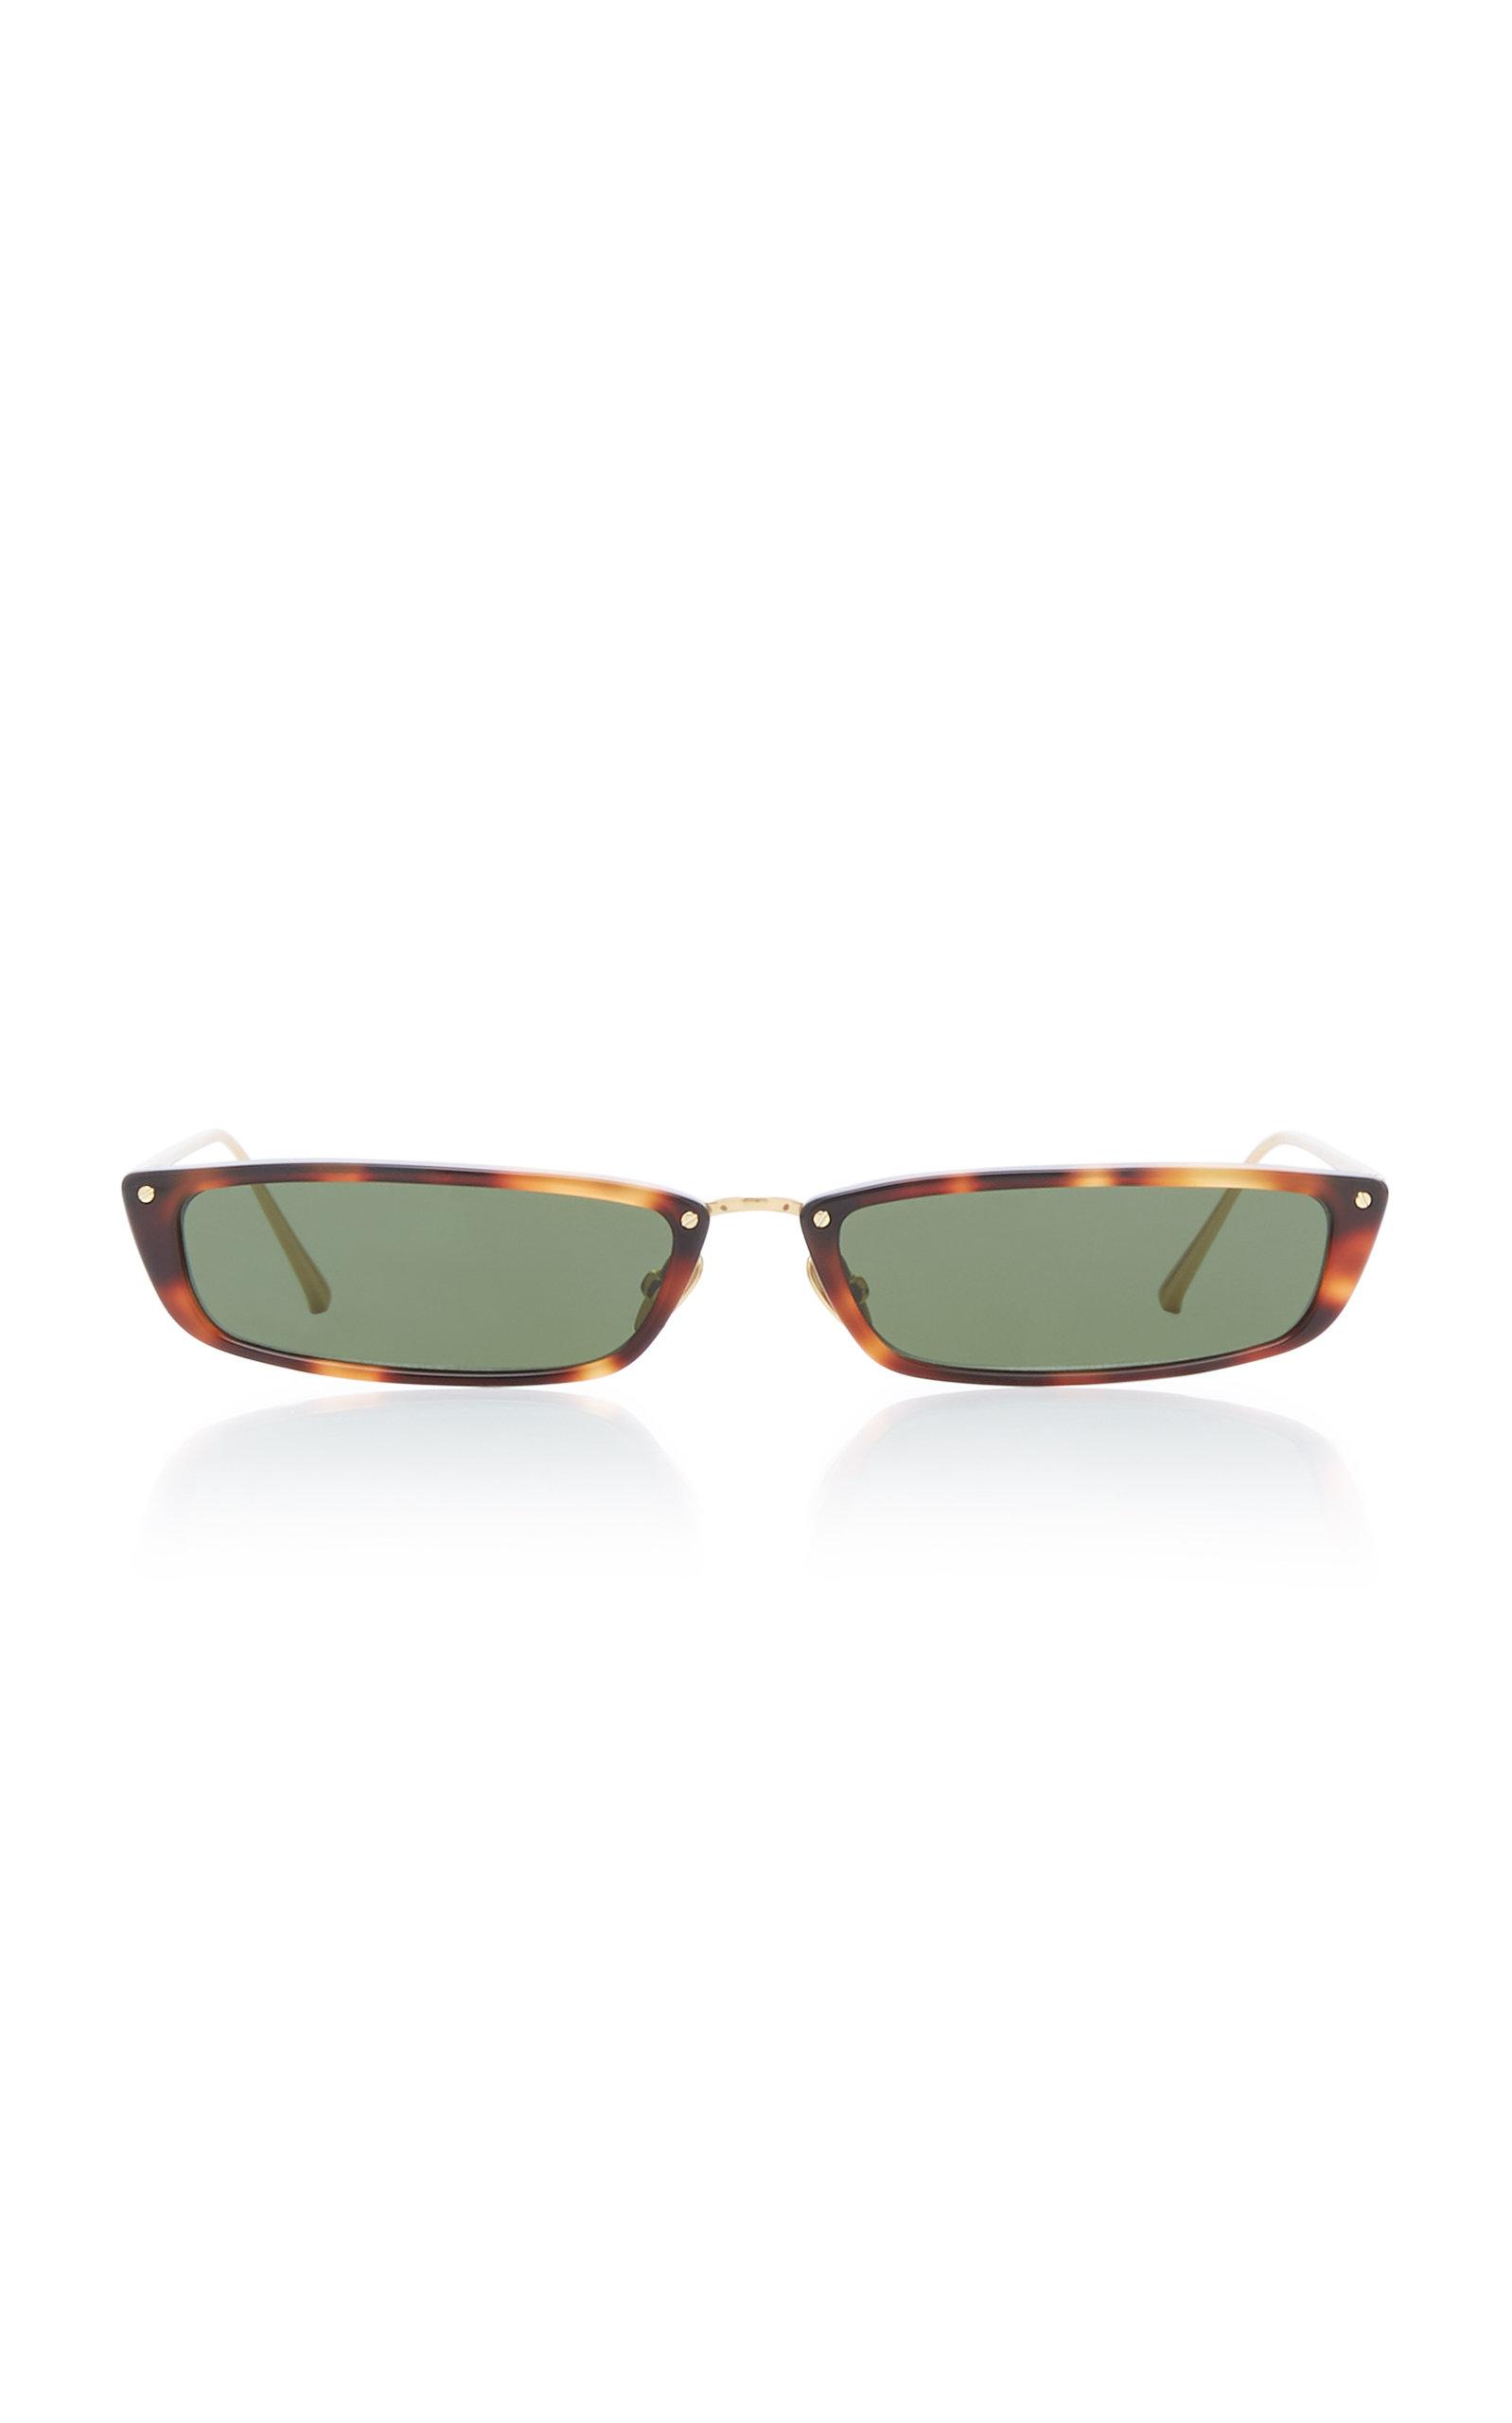 Rectangle-Frame Acetate Sunglasses by Linda Farrow, available on modaoperandi.com for $645 Kendall Jenner Sunglasses Exact Product